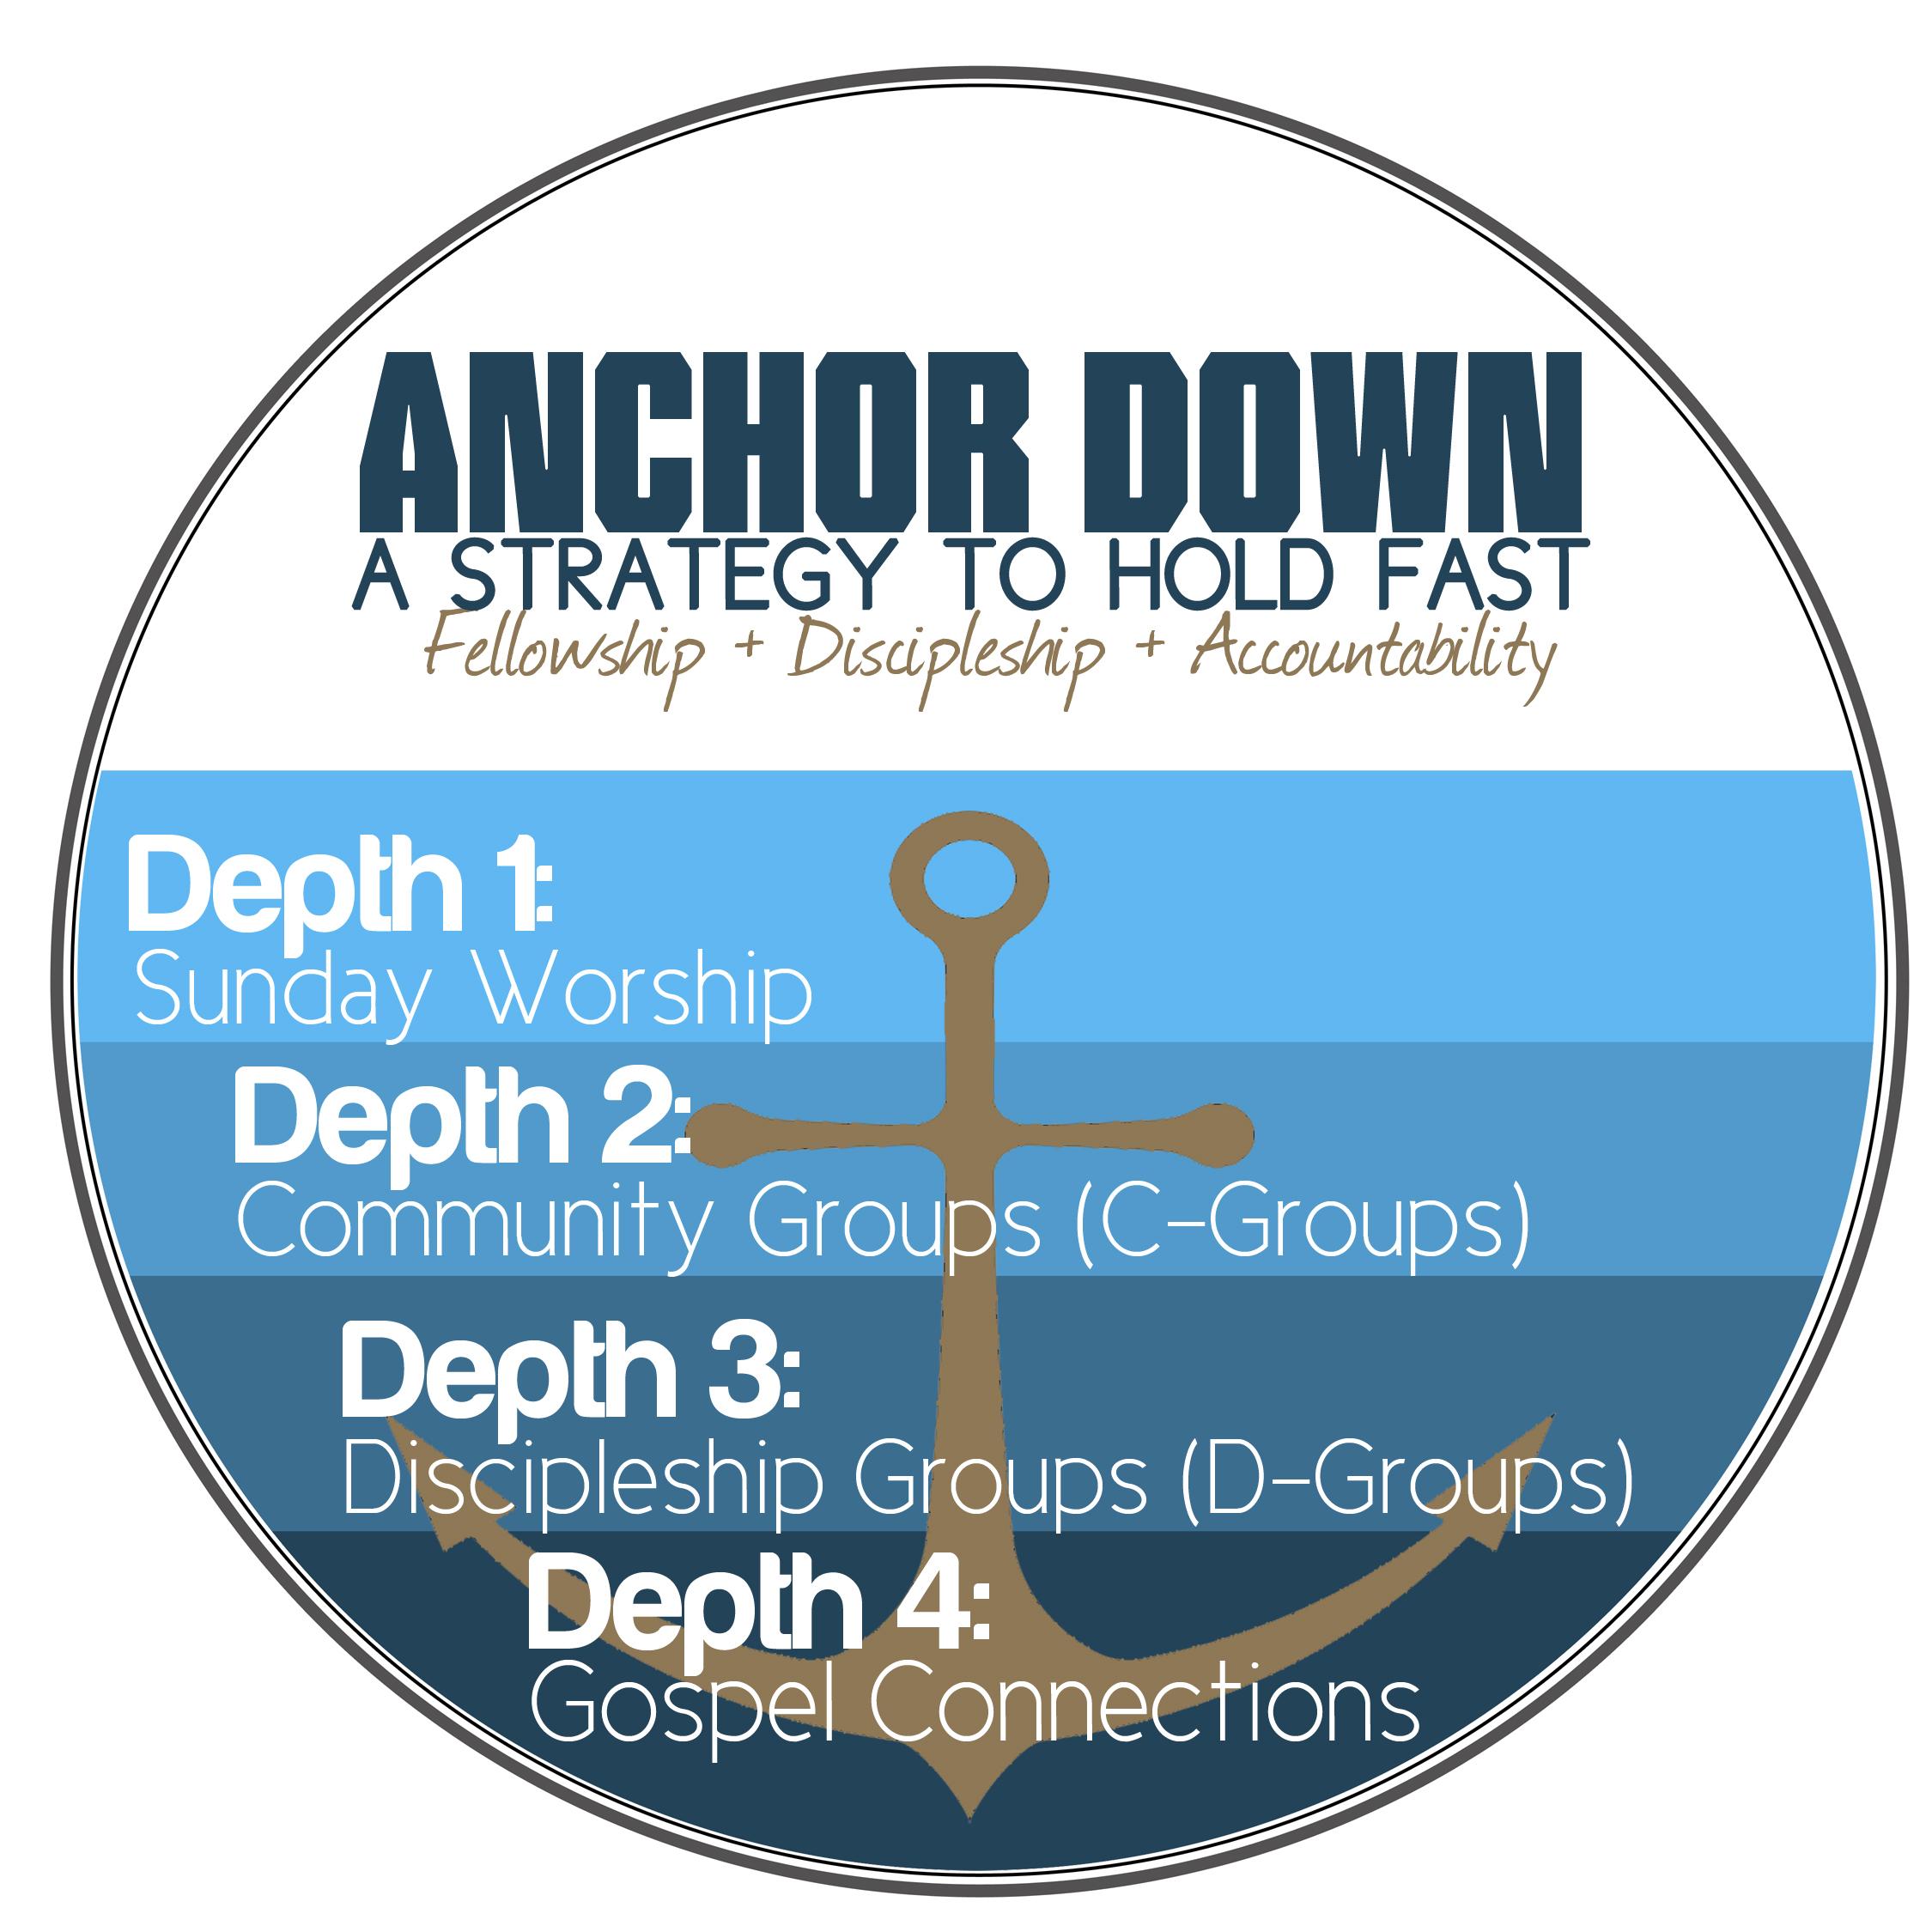 Anchor Down Strategy.jpg